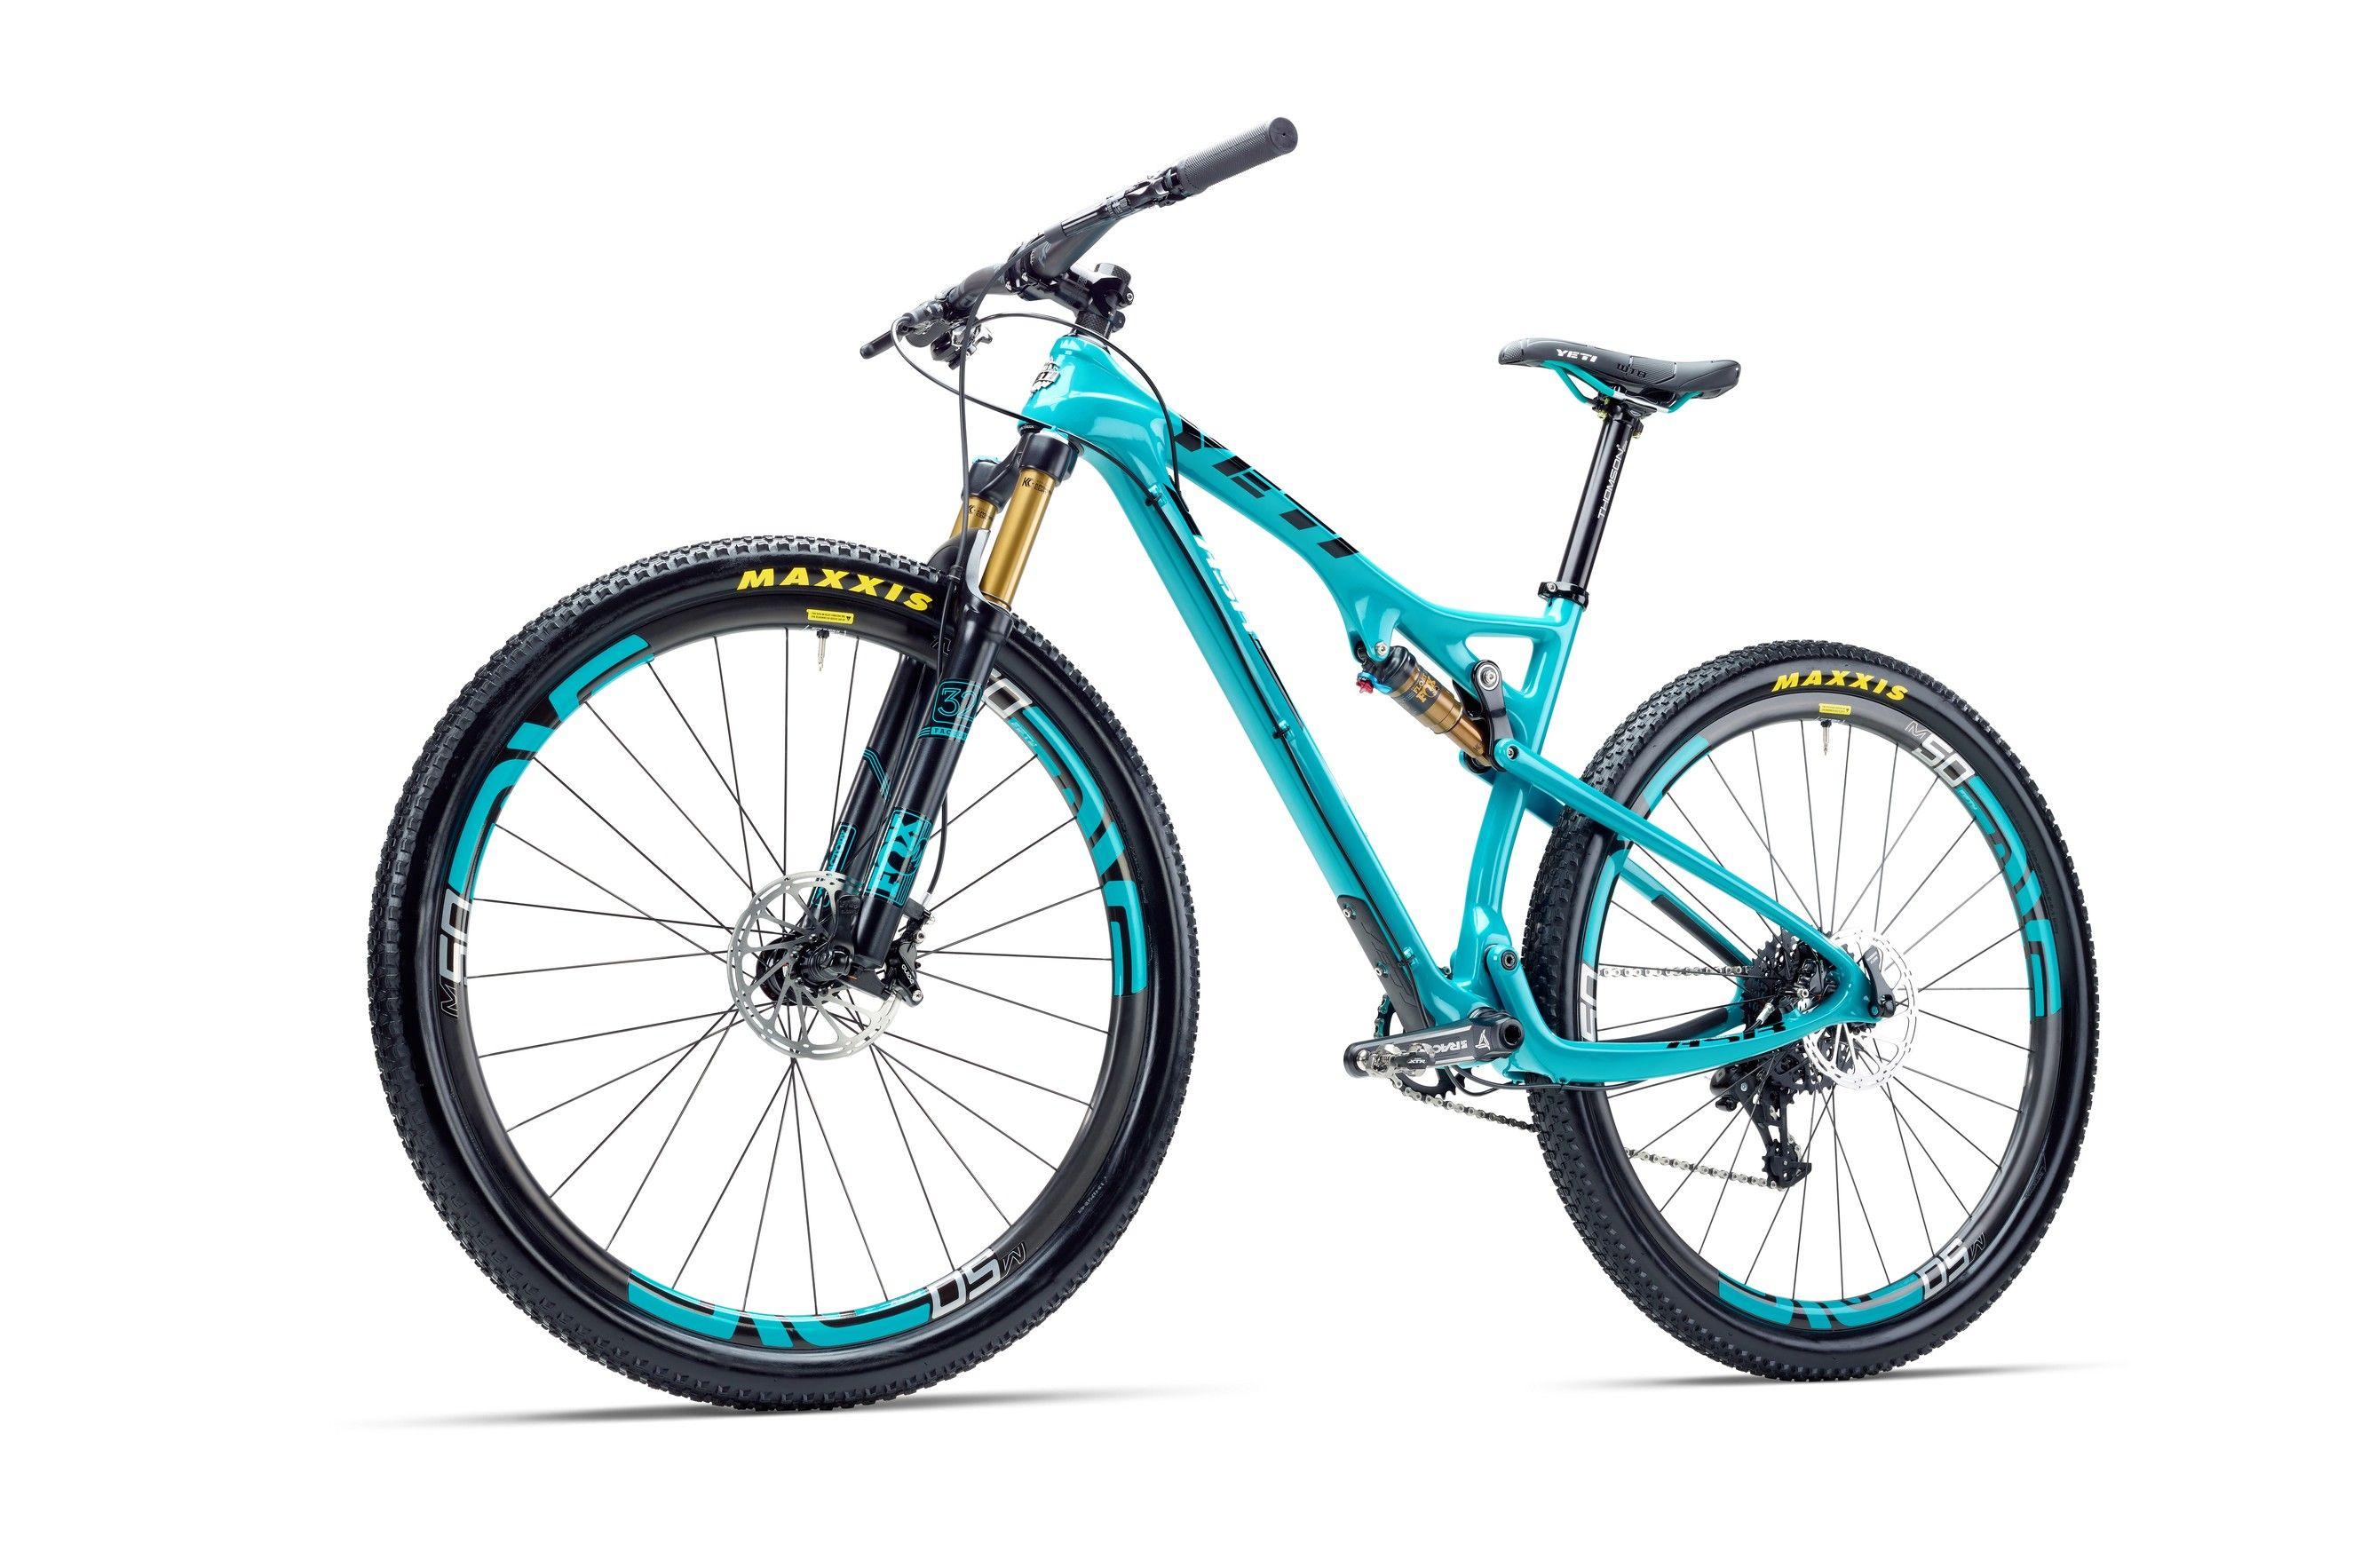 YETI ASRc Carbon Rahmenset Turquoise 2016 - www.rider-store.de - Die ...